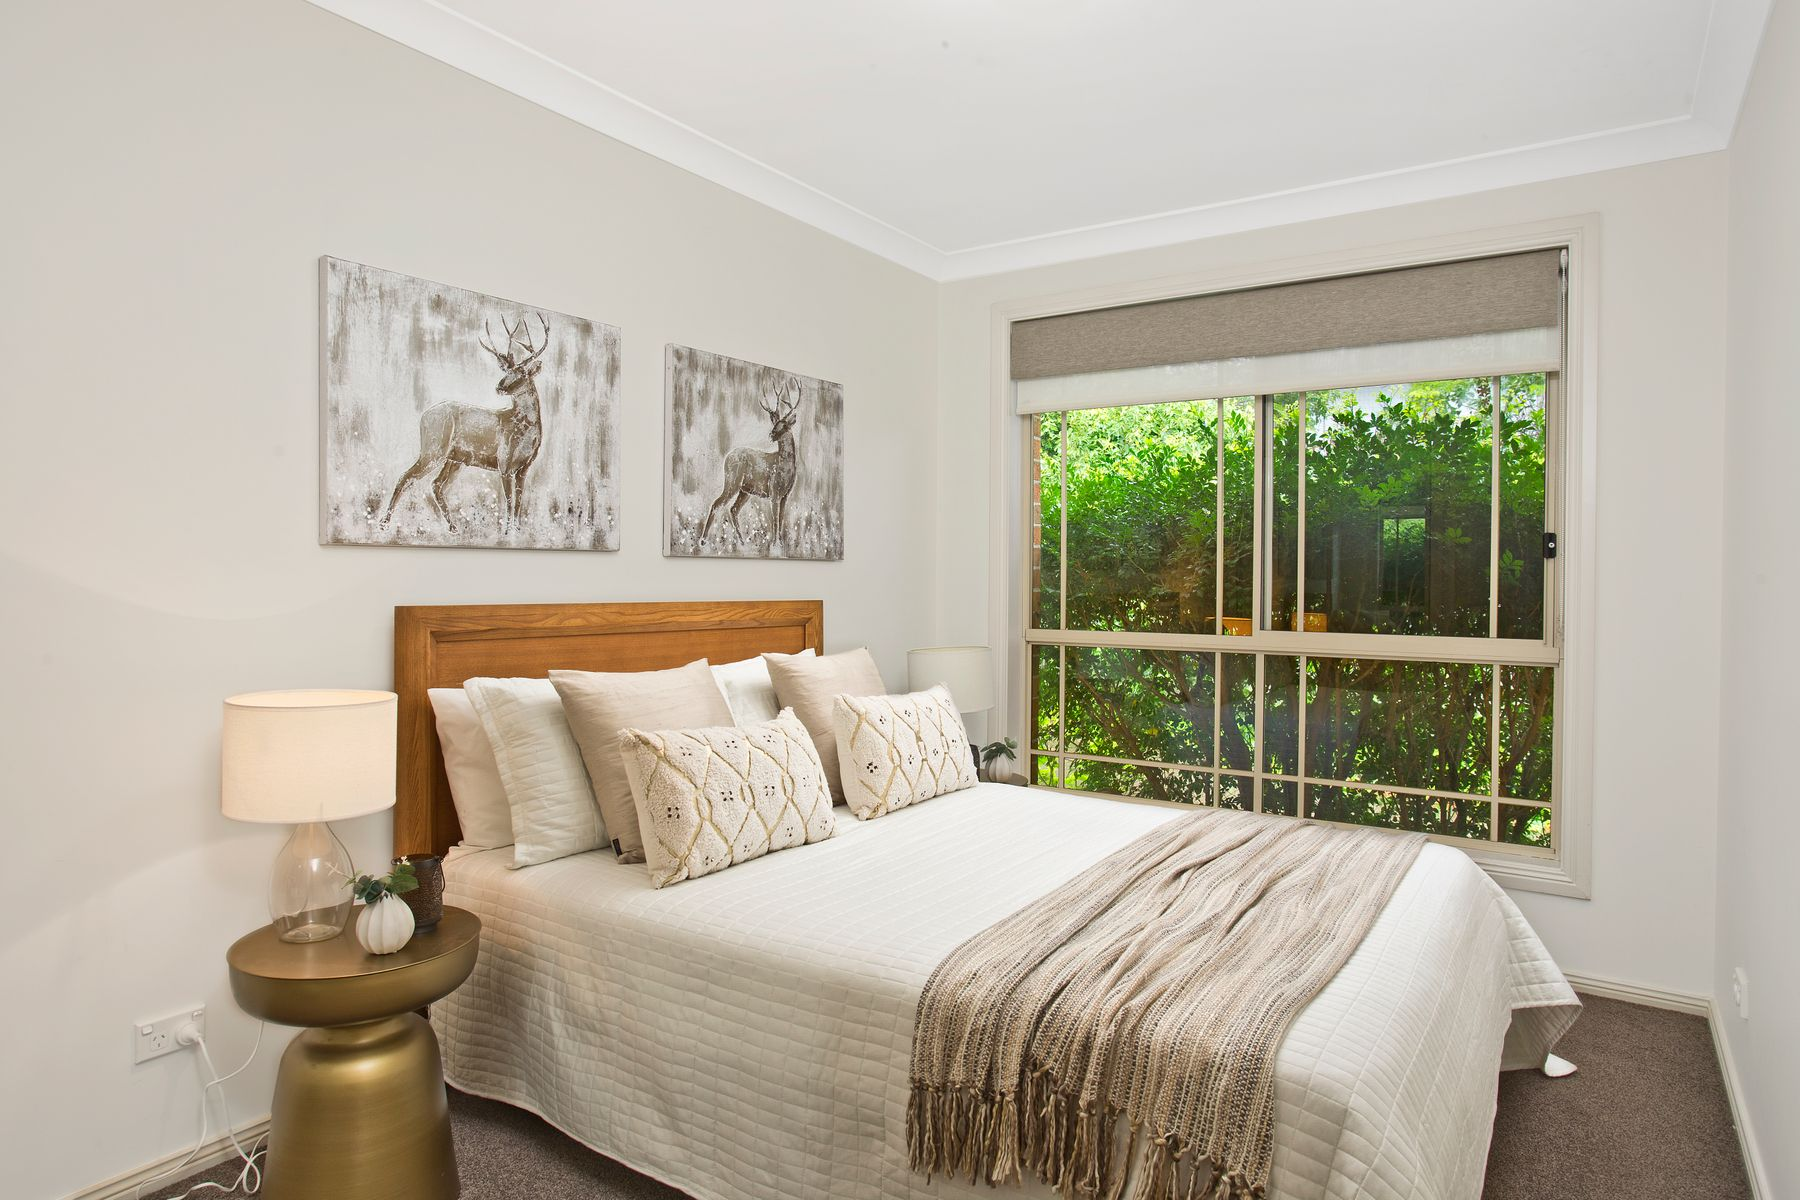 3/428 Blaxland Road, Denistone, NSW 2114